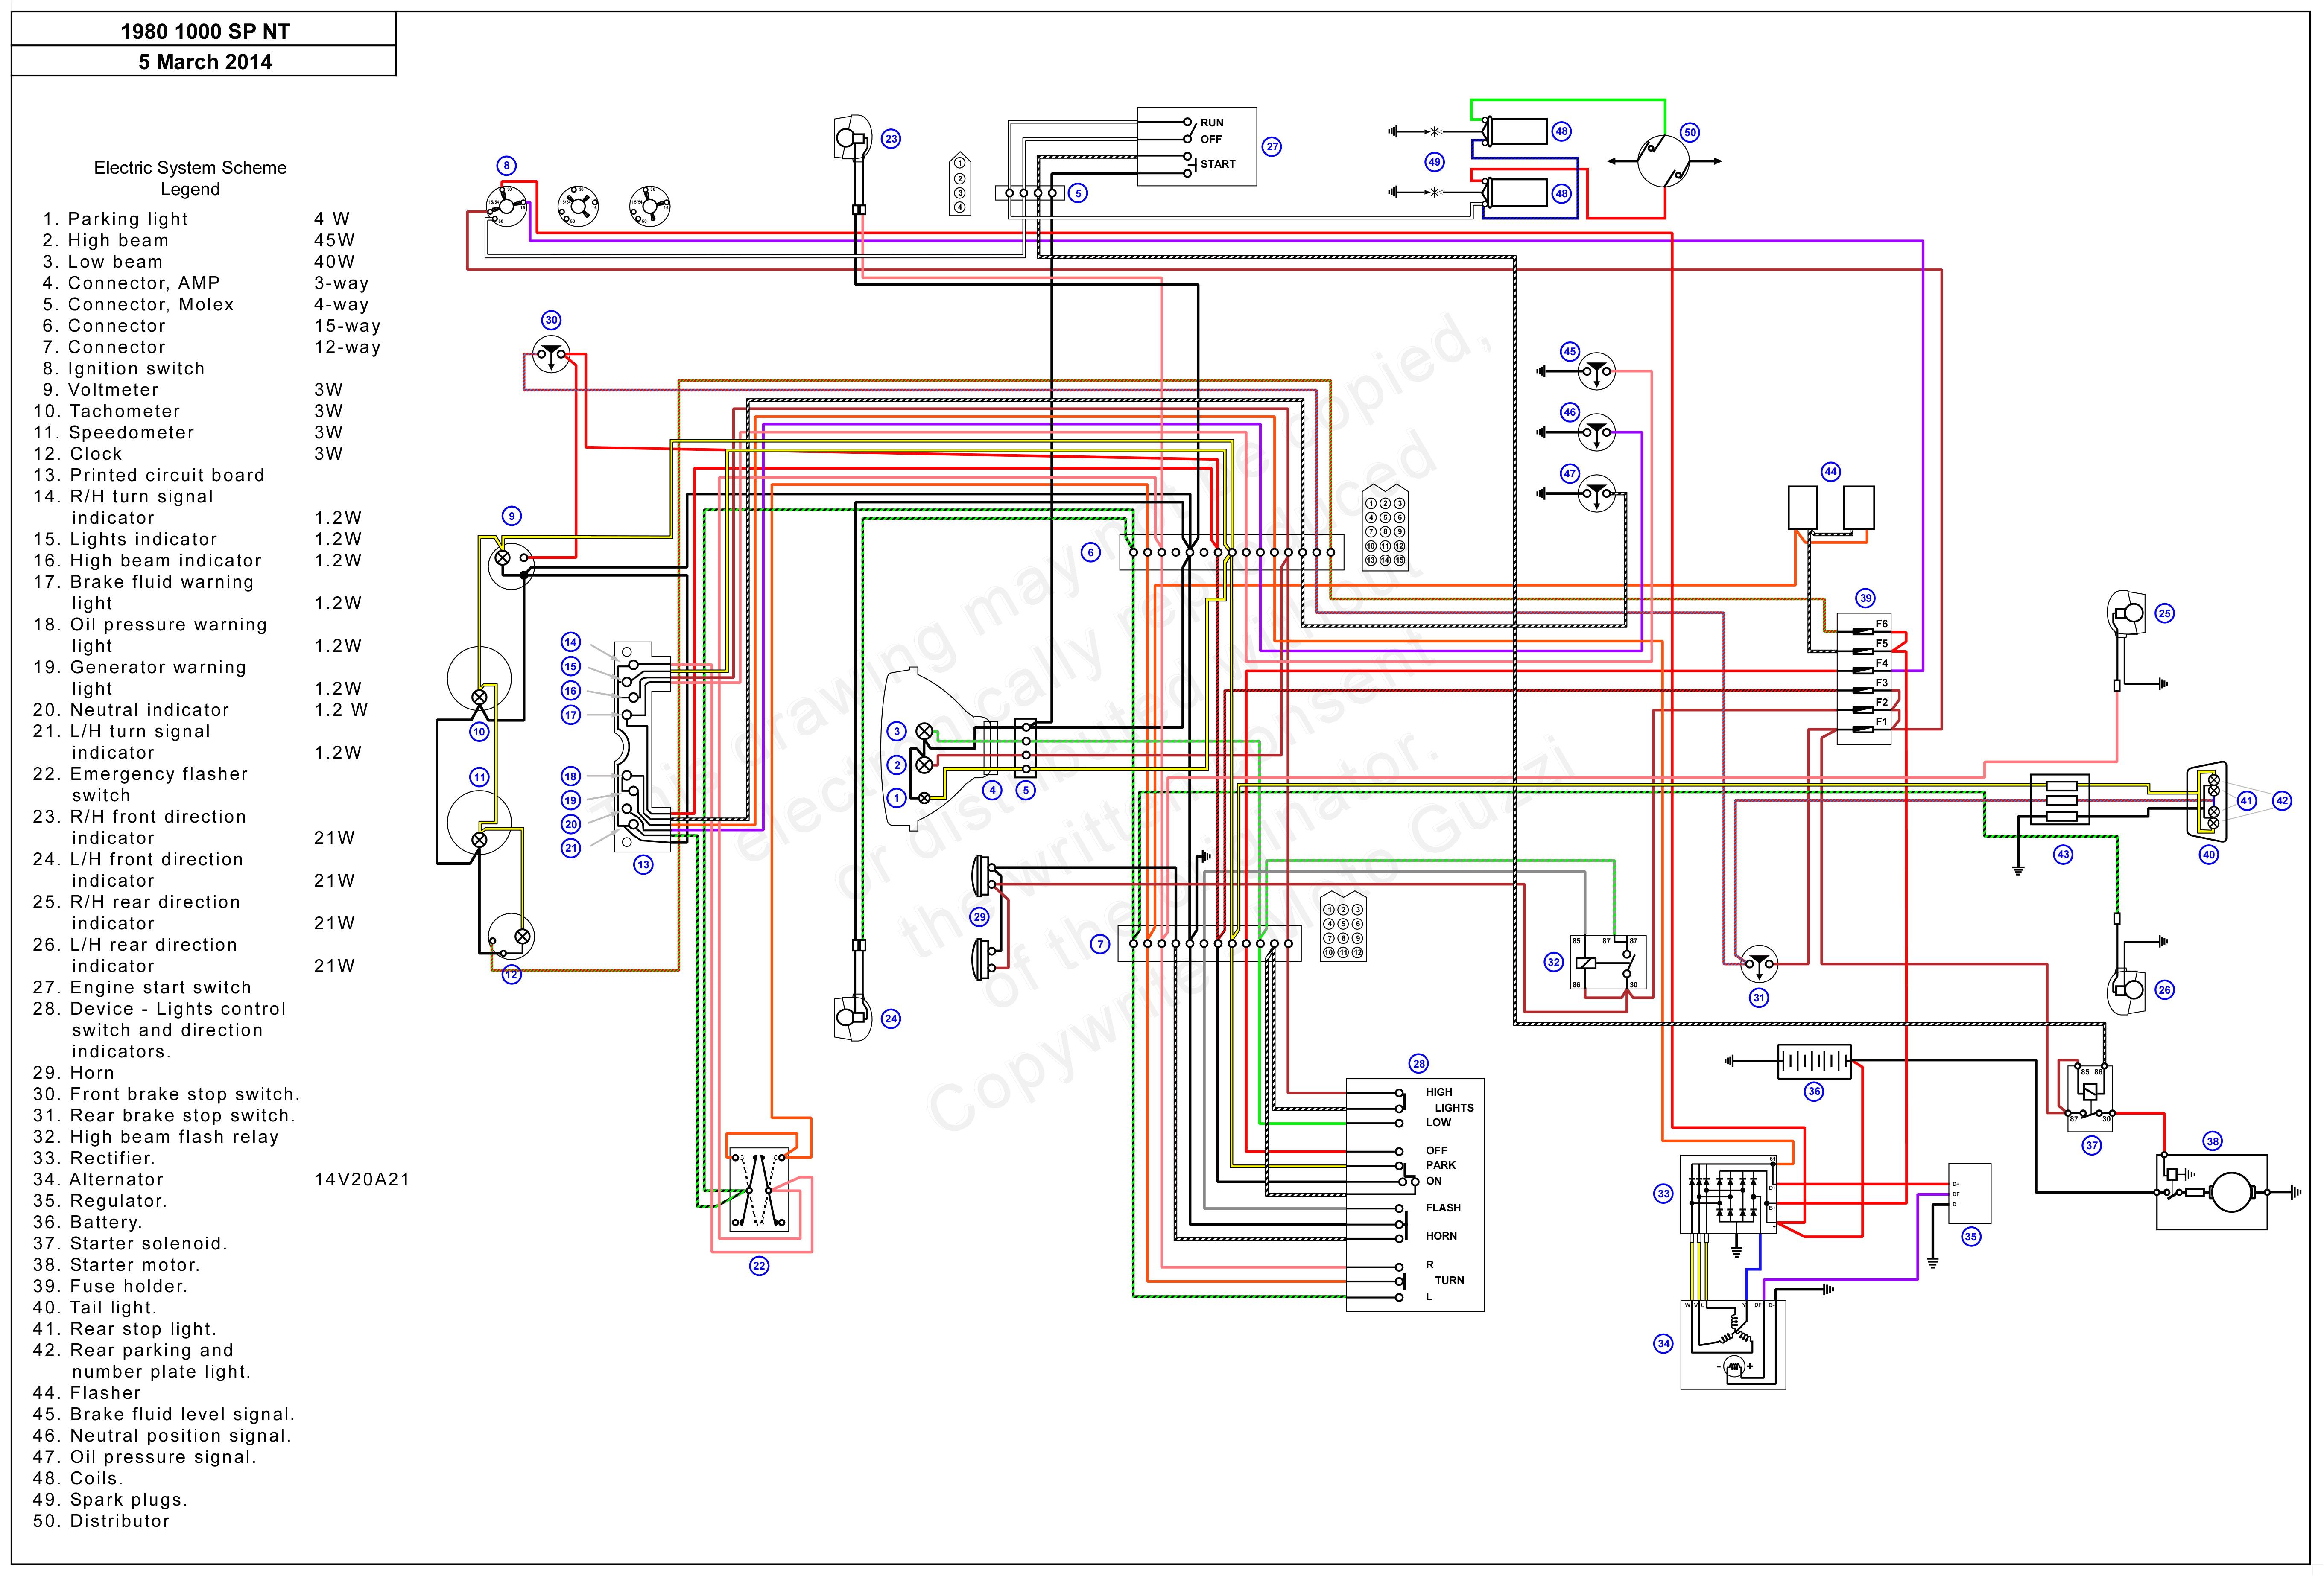 wiring diagram suzuki jimny wiring diagram articlewiring diagram suzuki jimny